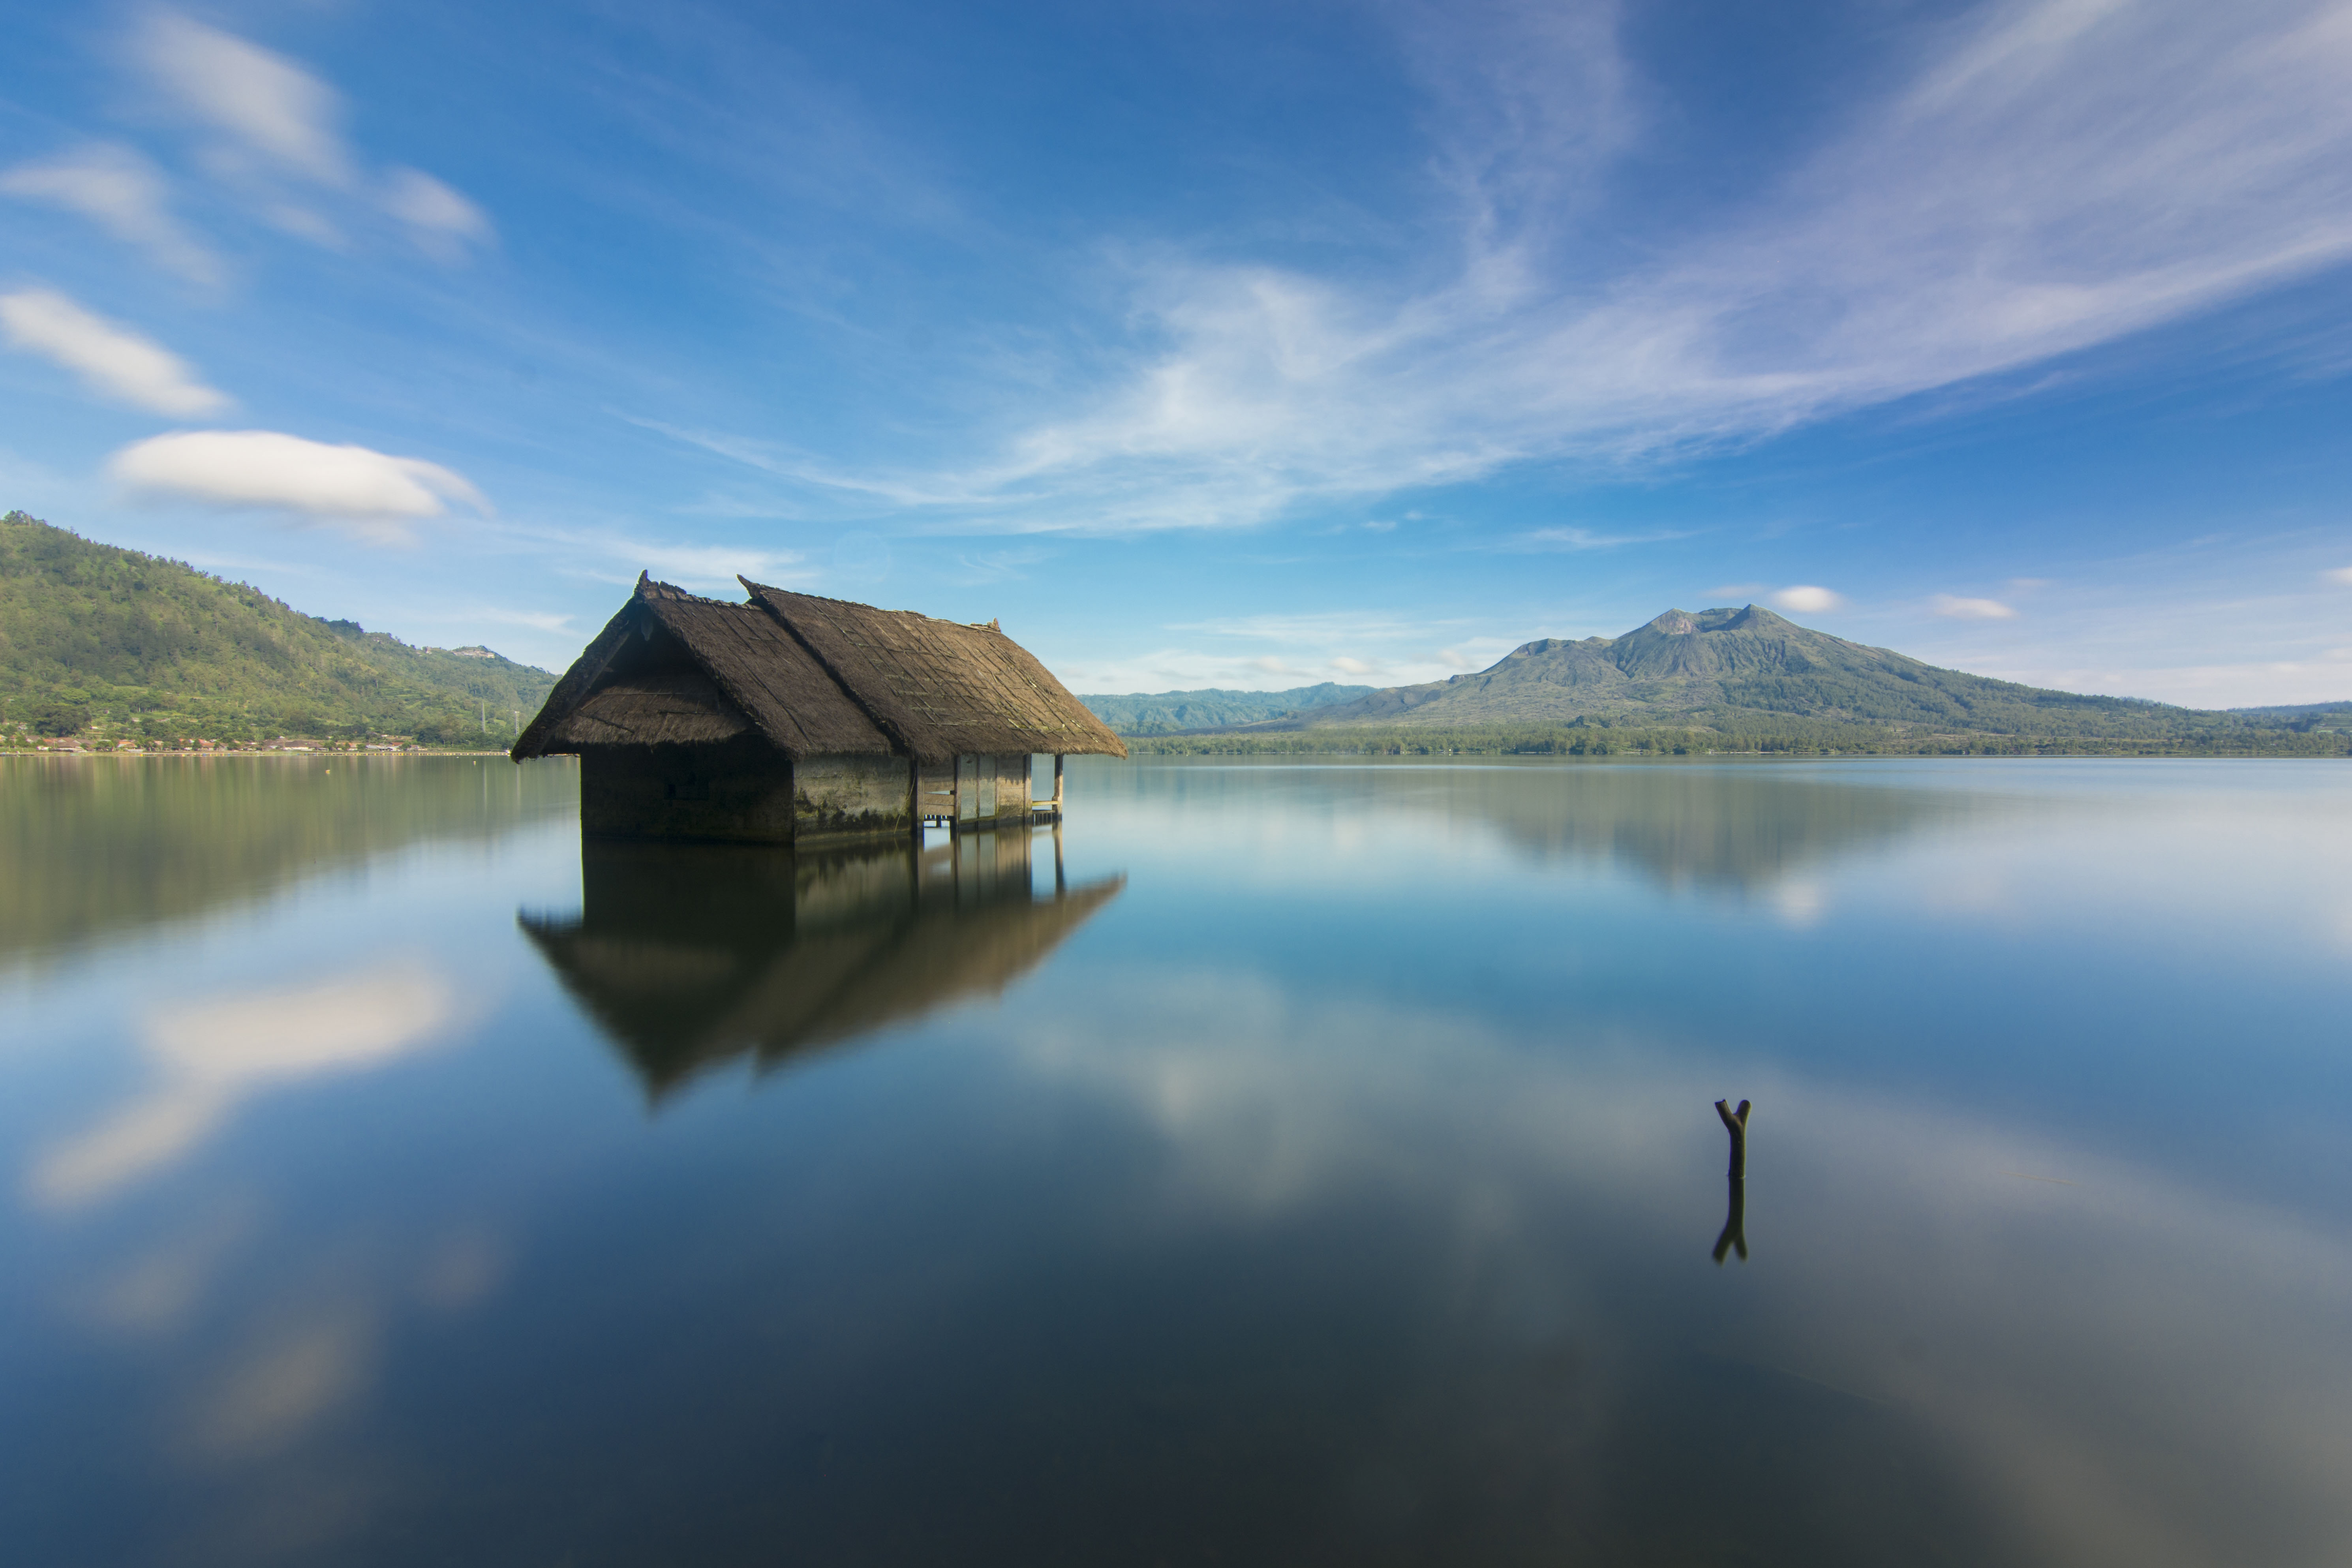 Surabaya ke Bali: Danau dan Gunung Batur